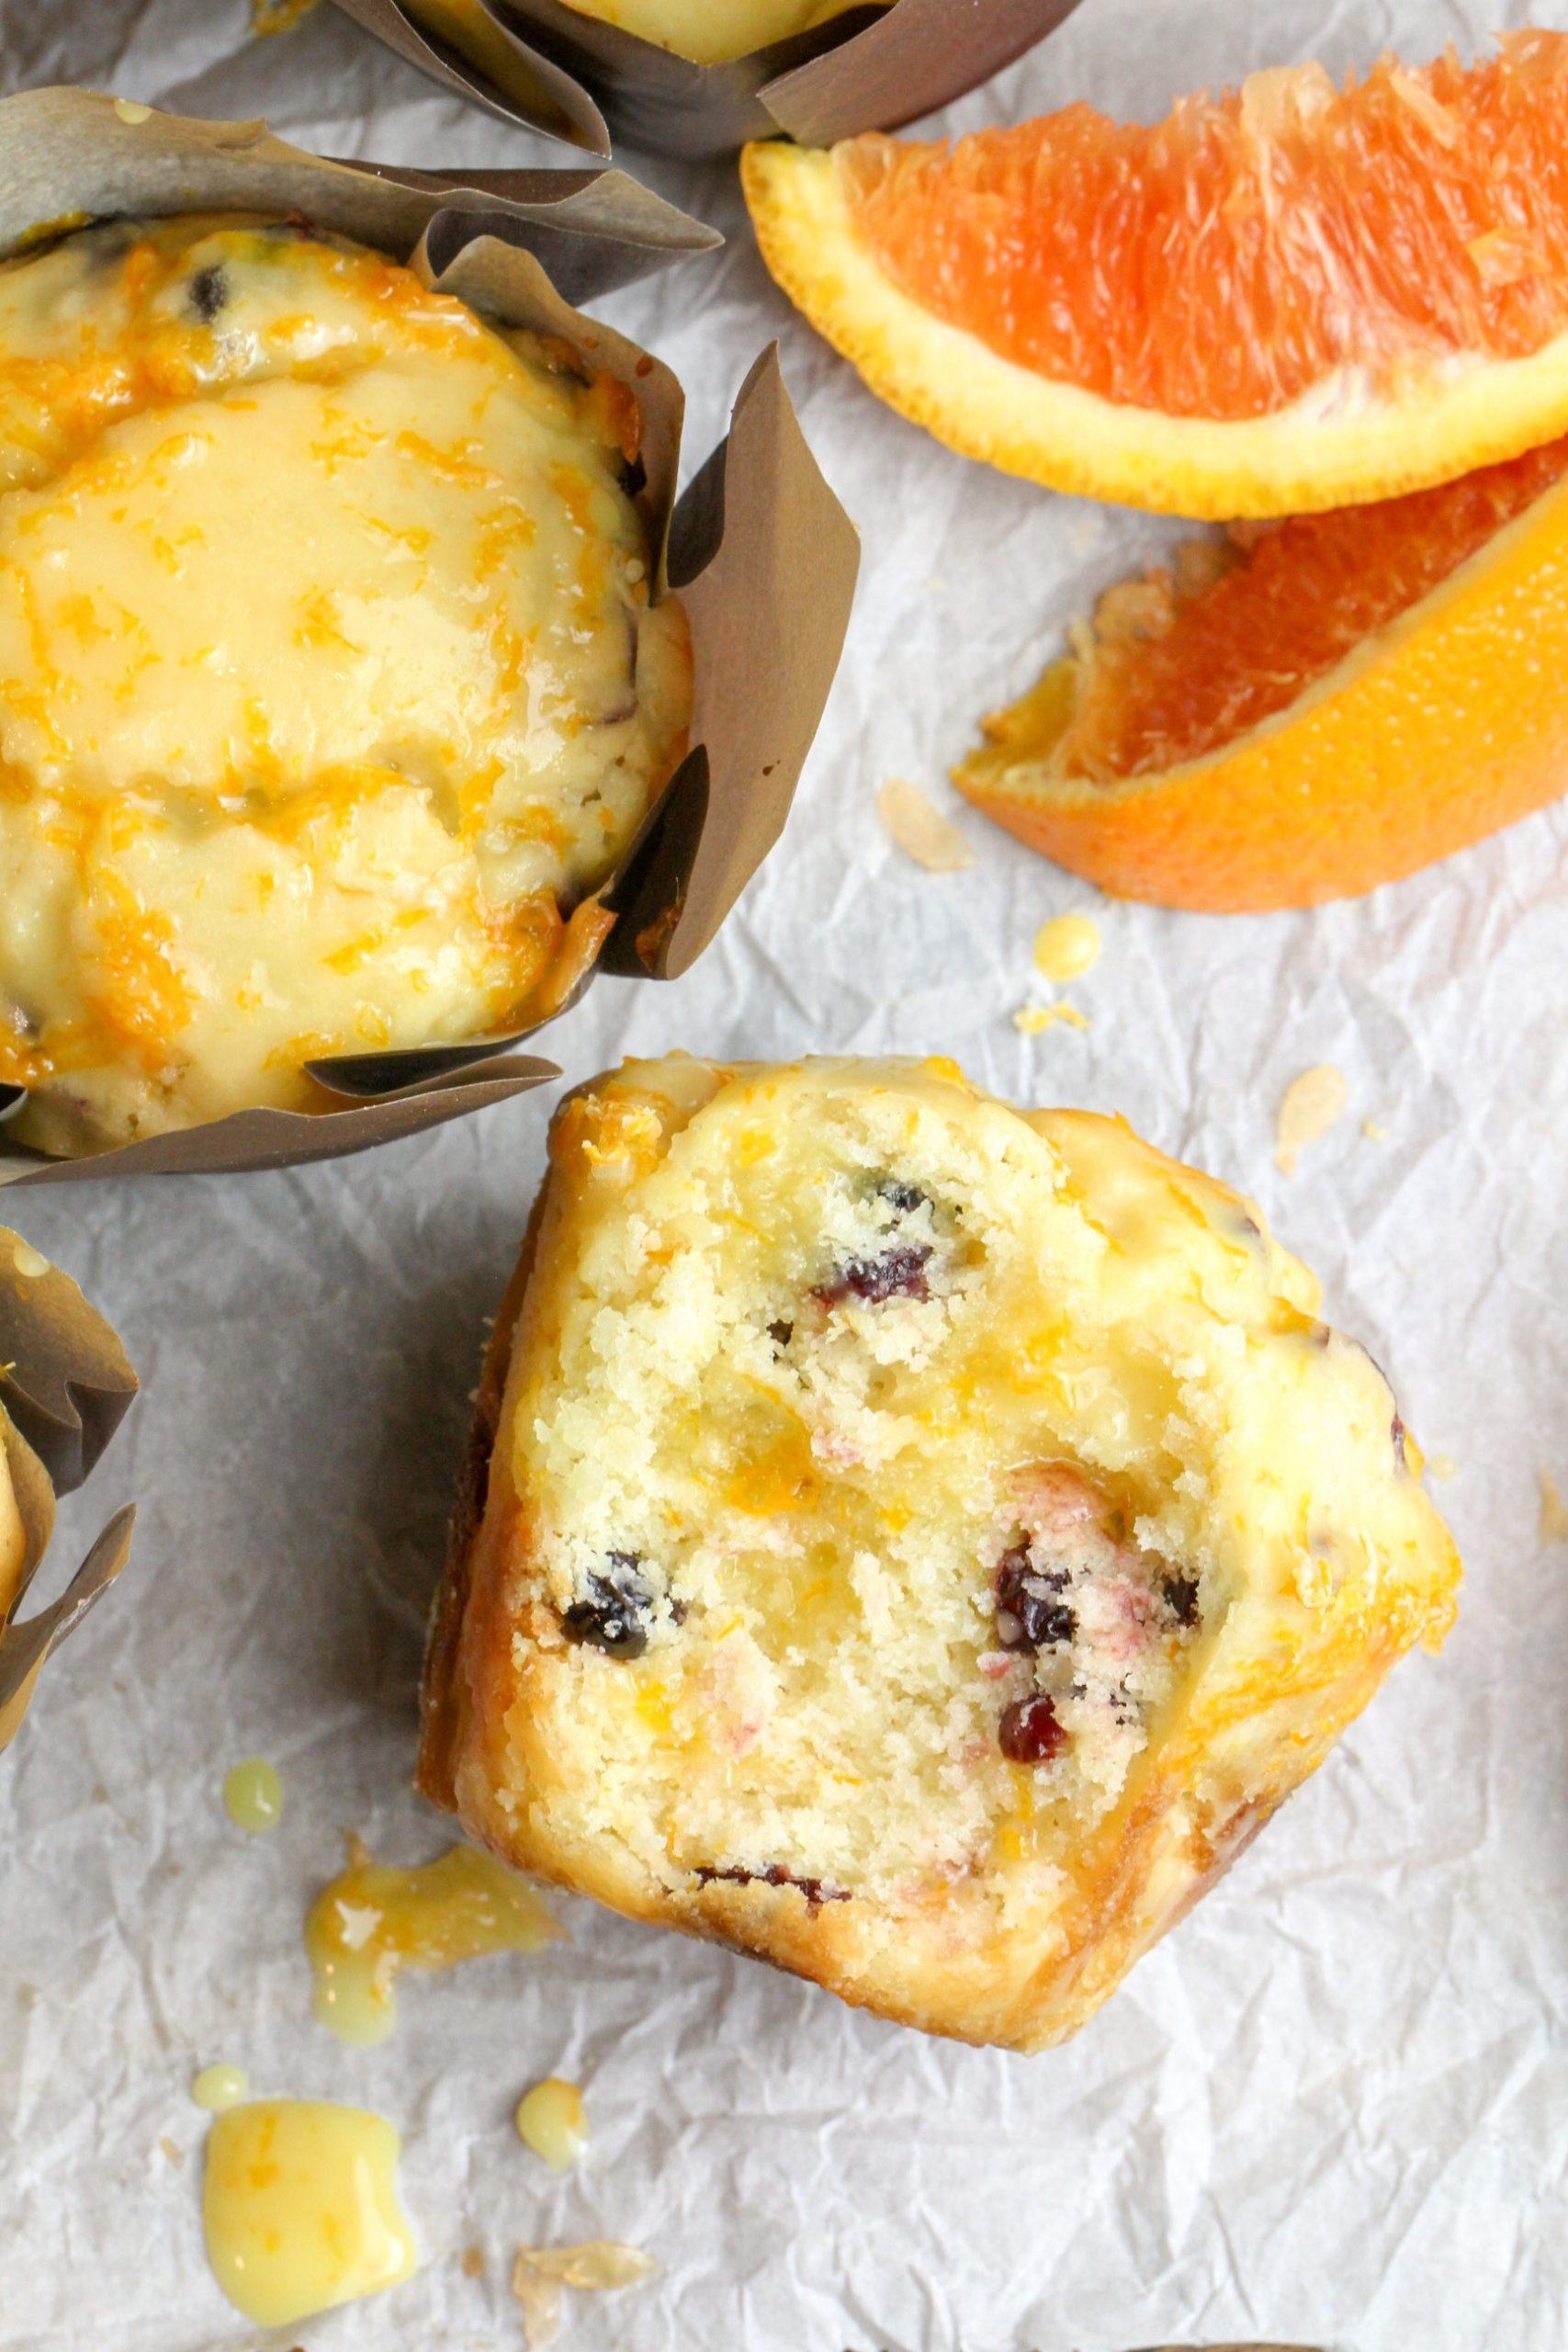 Zesty Buttery Orange Cranberry Muffins